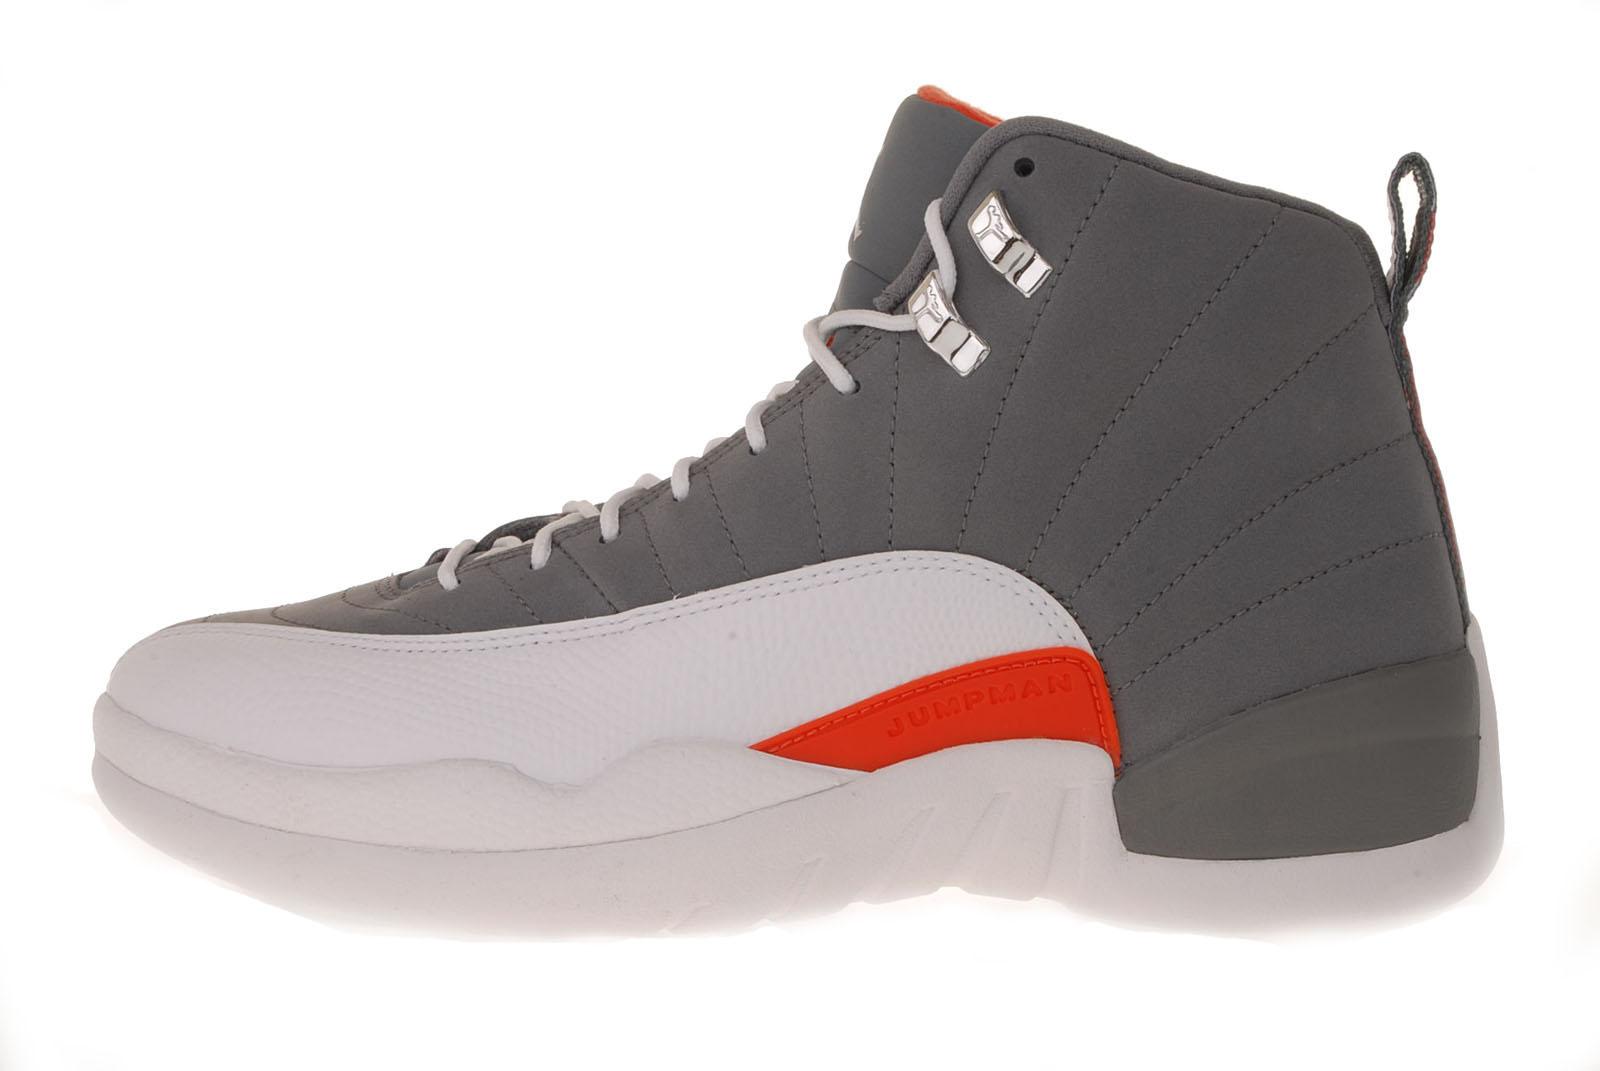 Nike Air Jordan 12 Retro XII Cool Grey White Team Orange ...